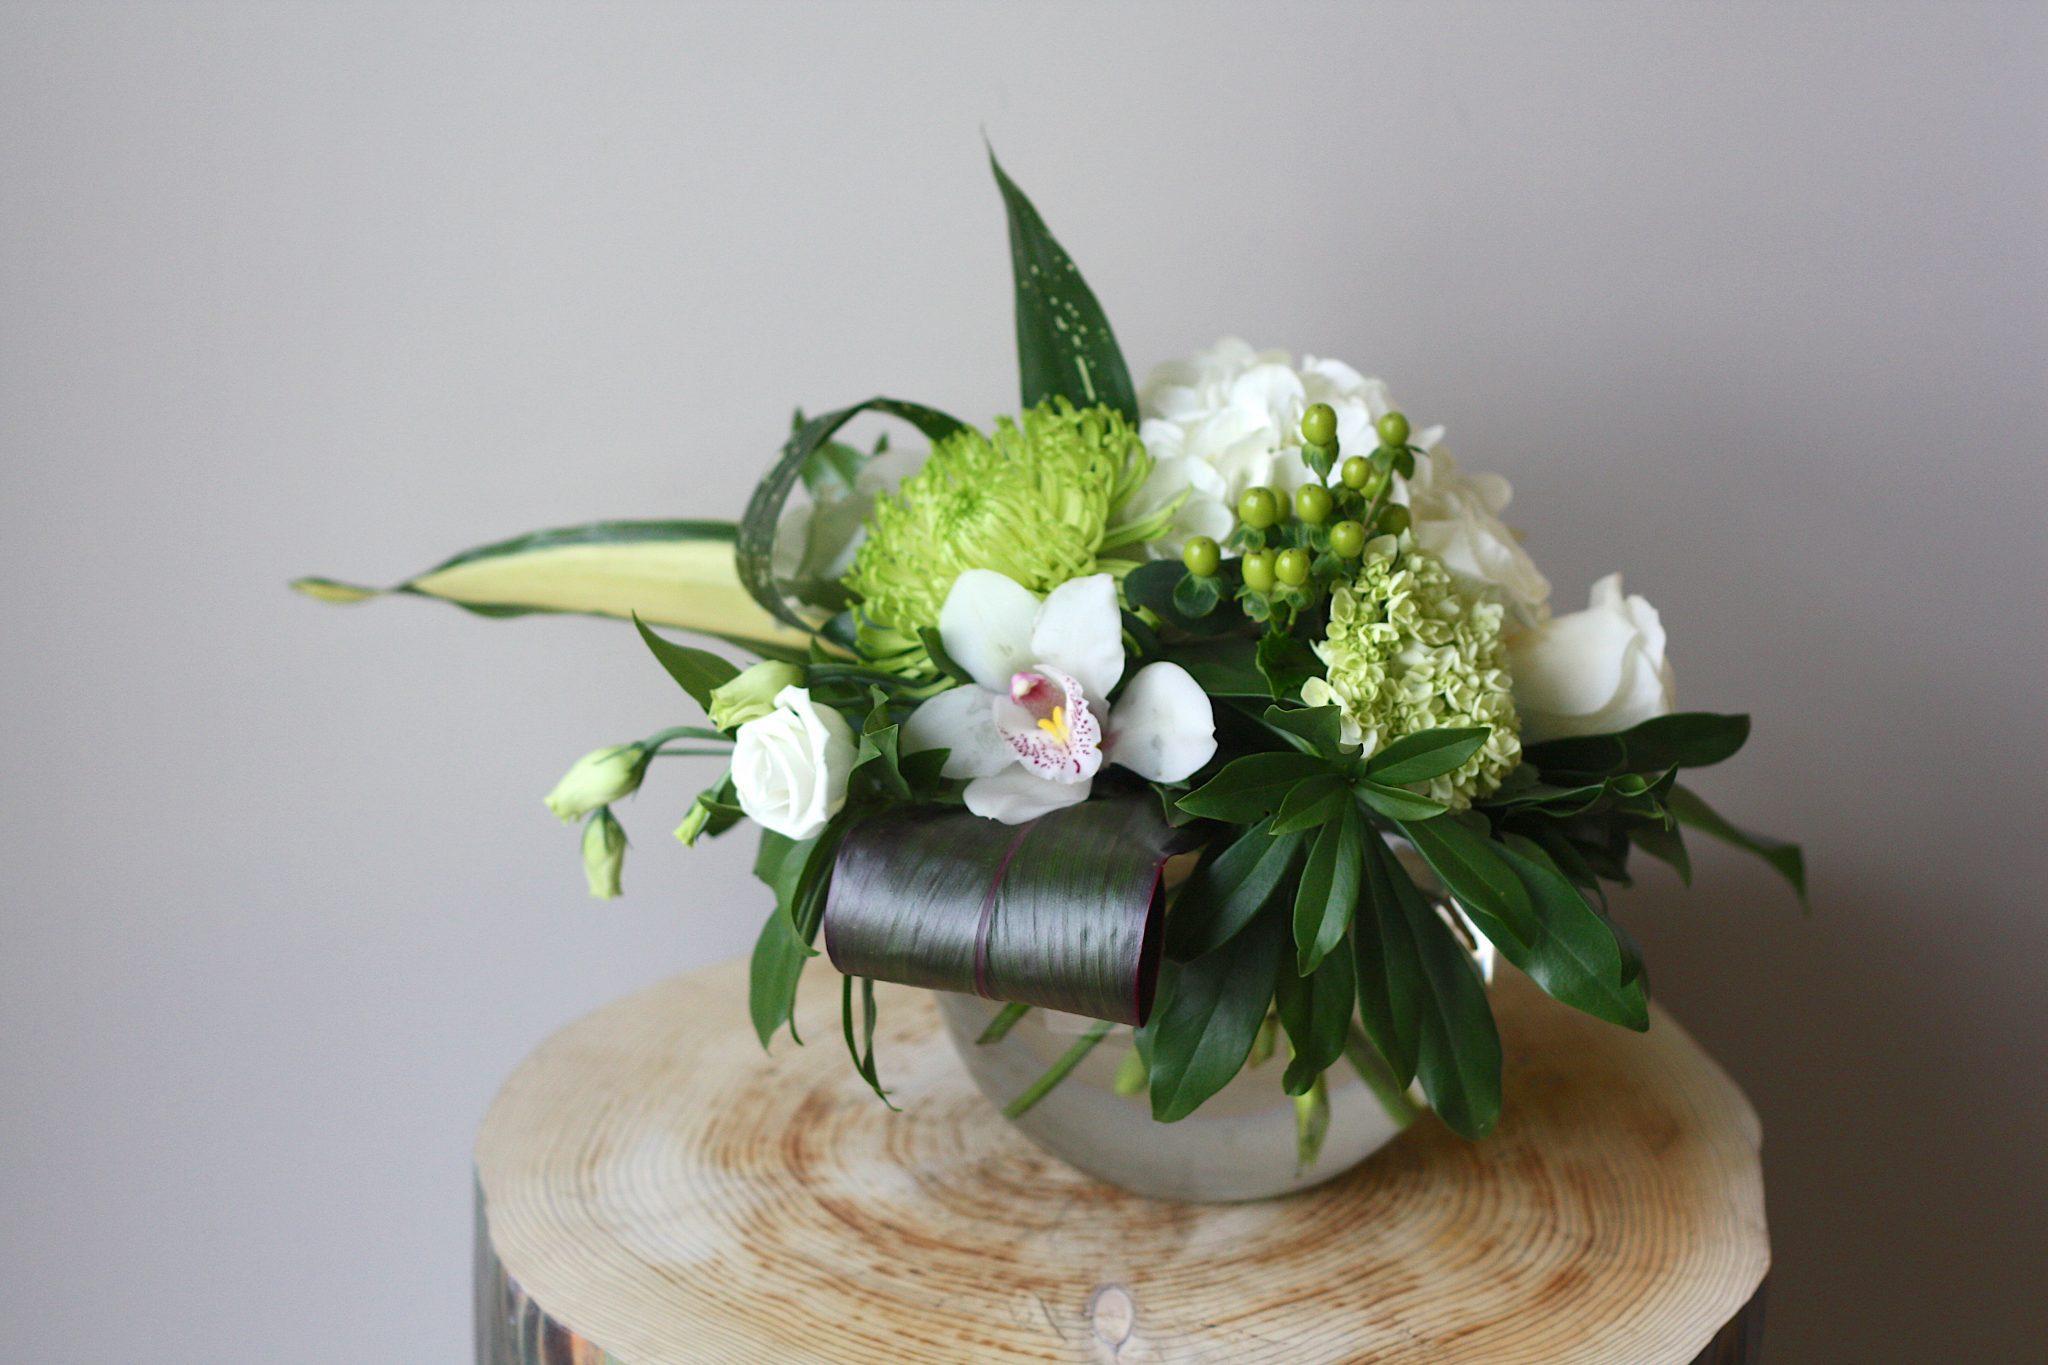 Flower Shop West Kelowna   Passionate Blooms Floral Design   sweet orchid